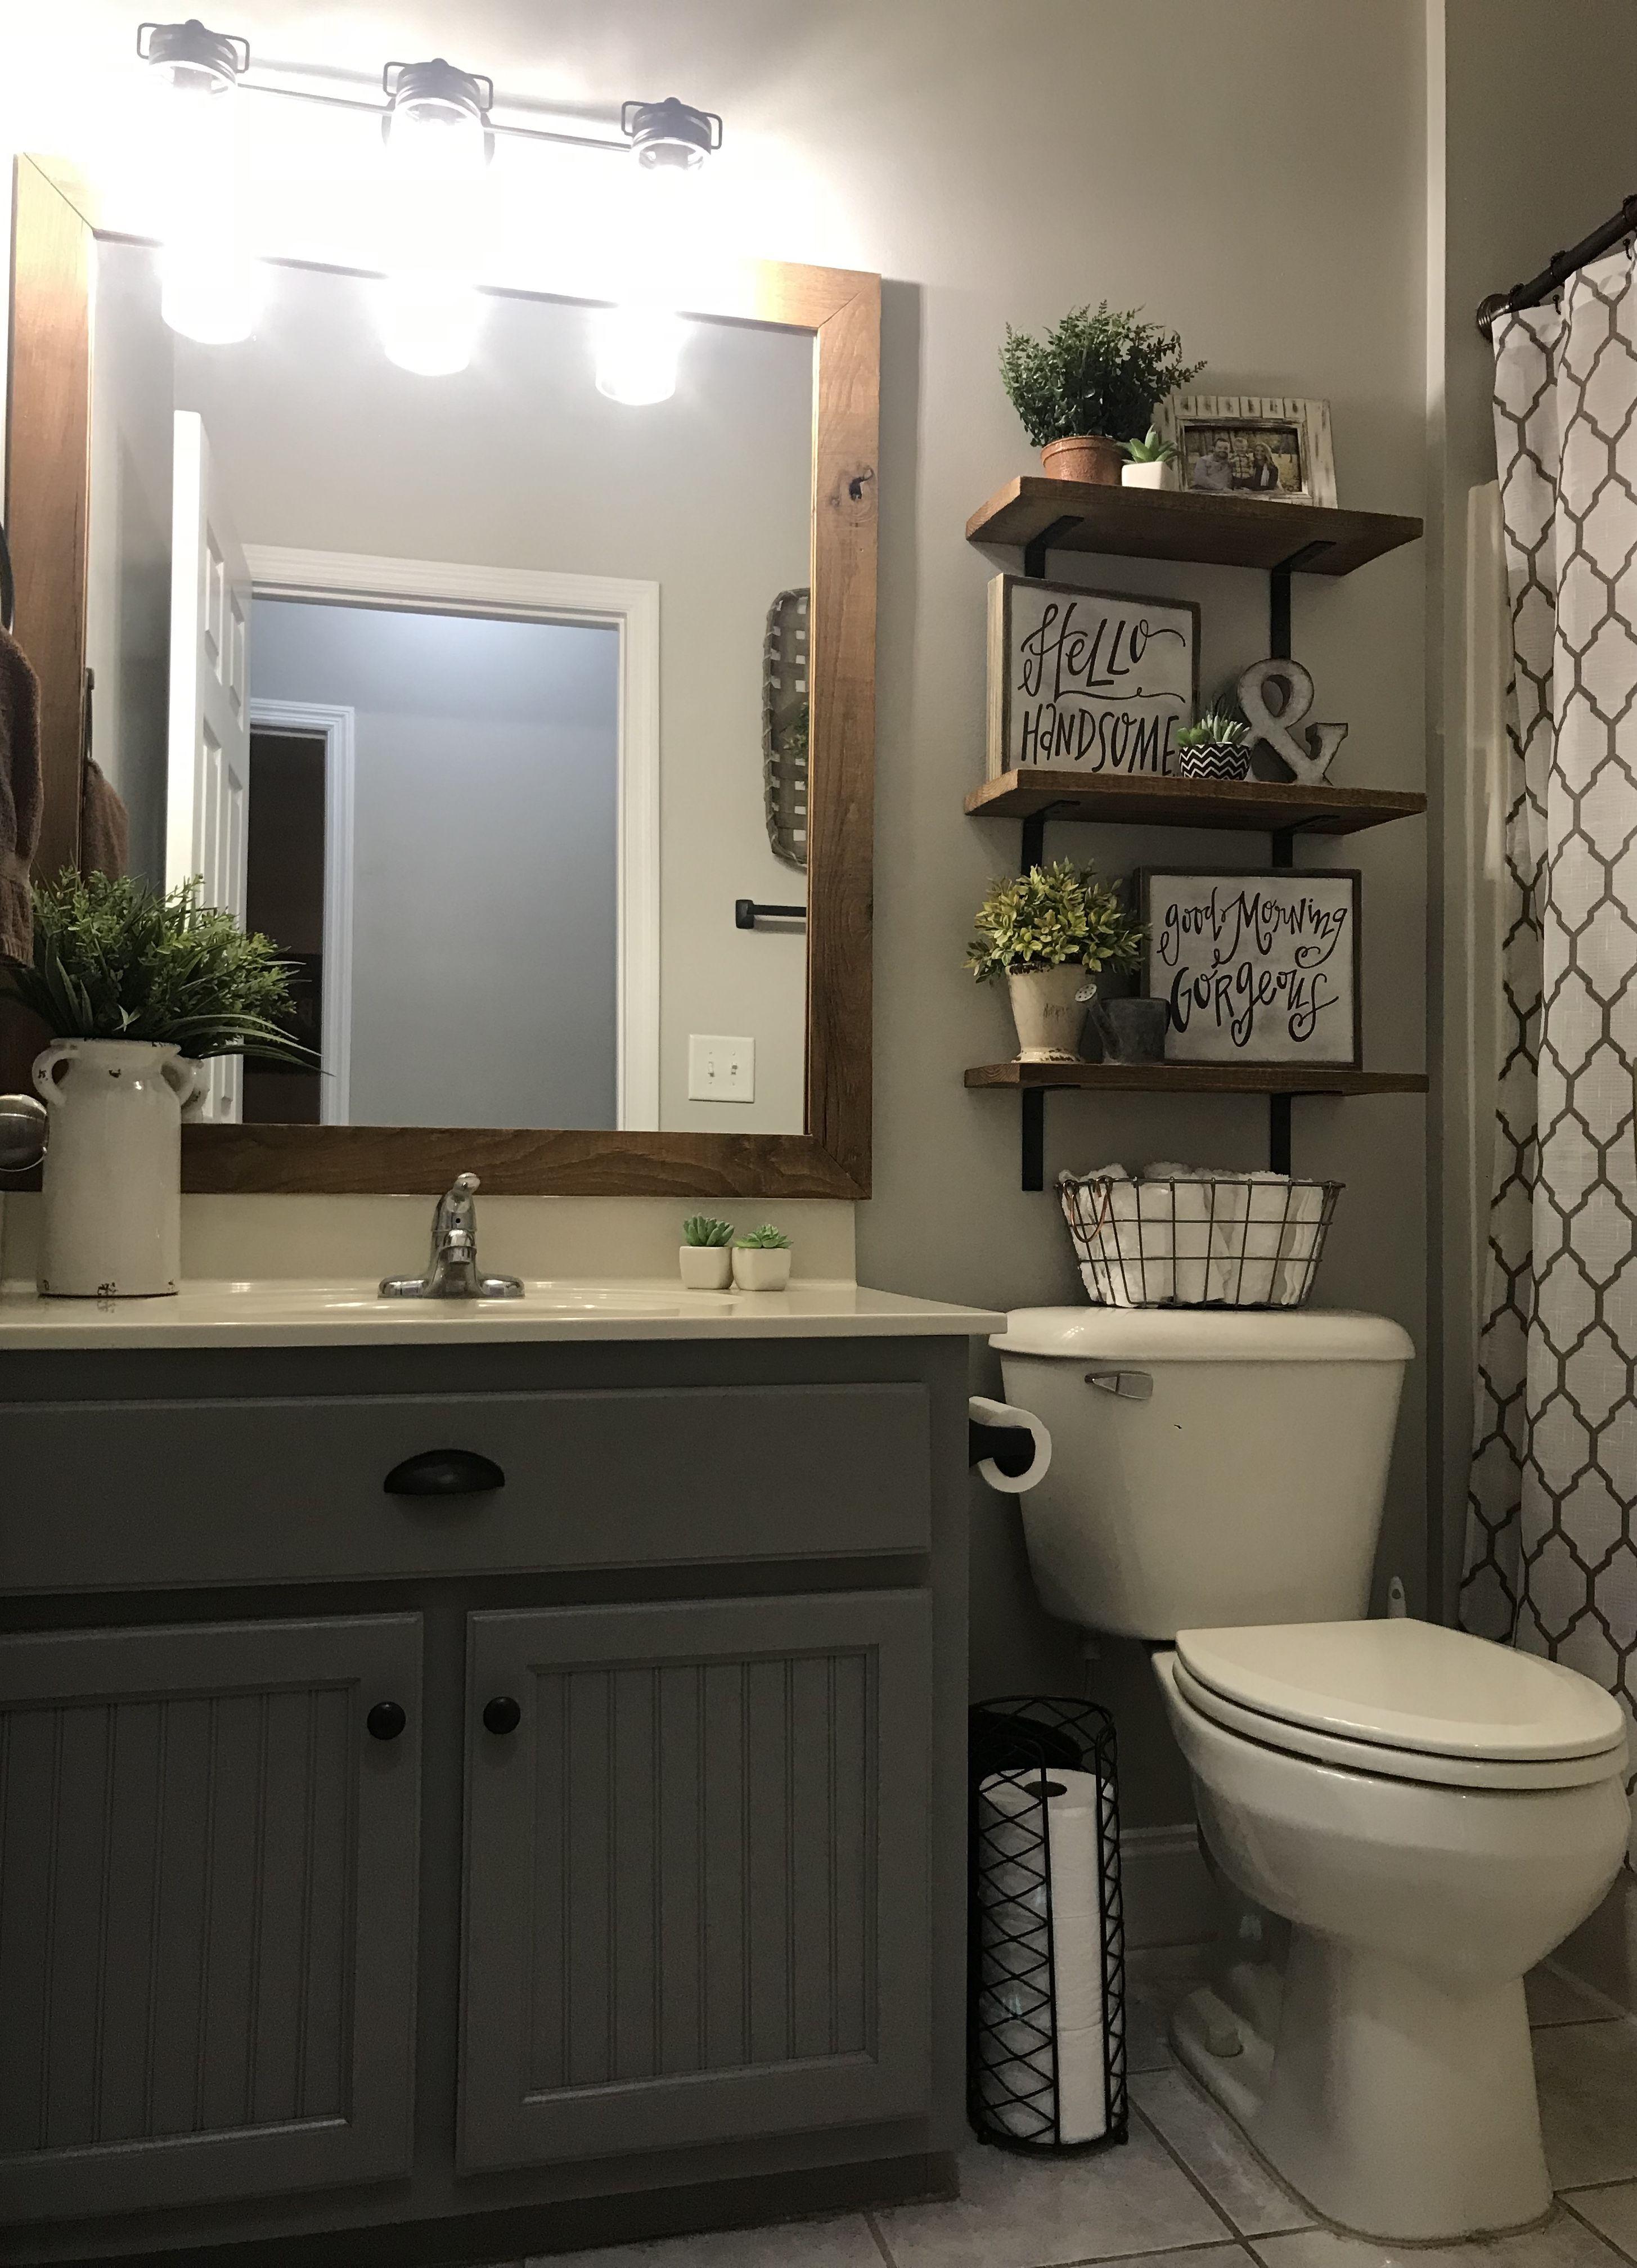 Guest Bathroom decor | Small bathroom decor, Guest ...